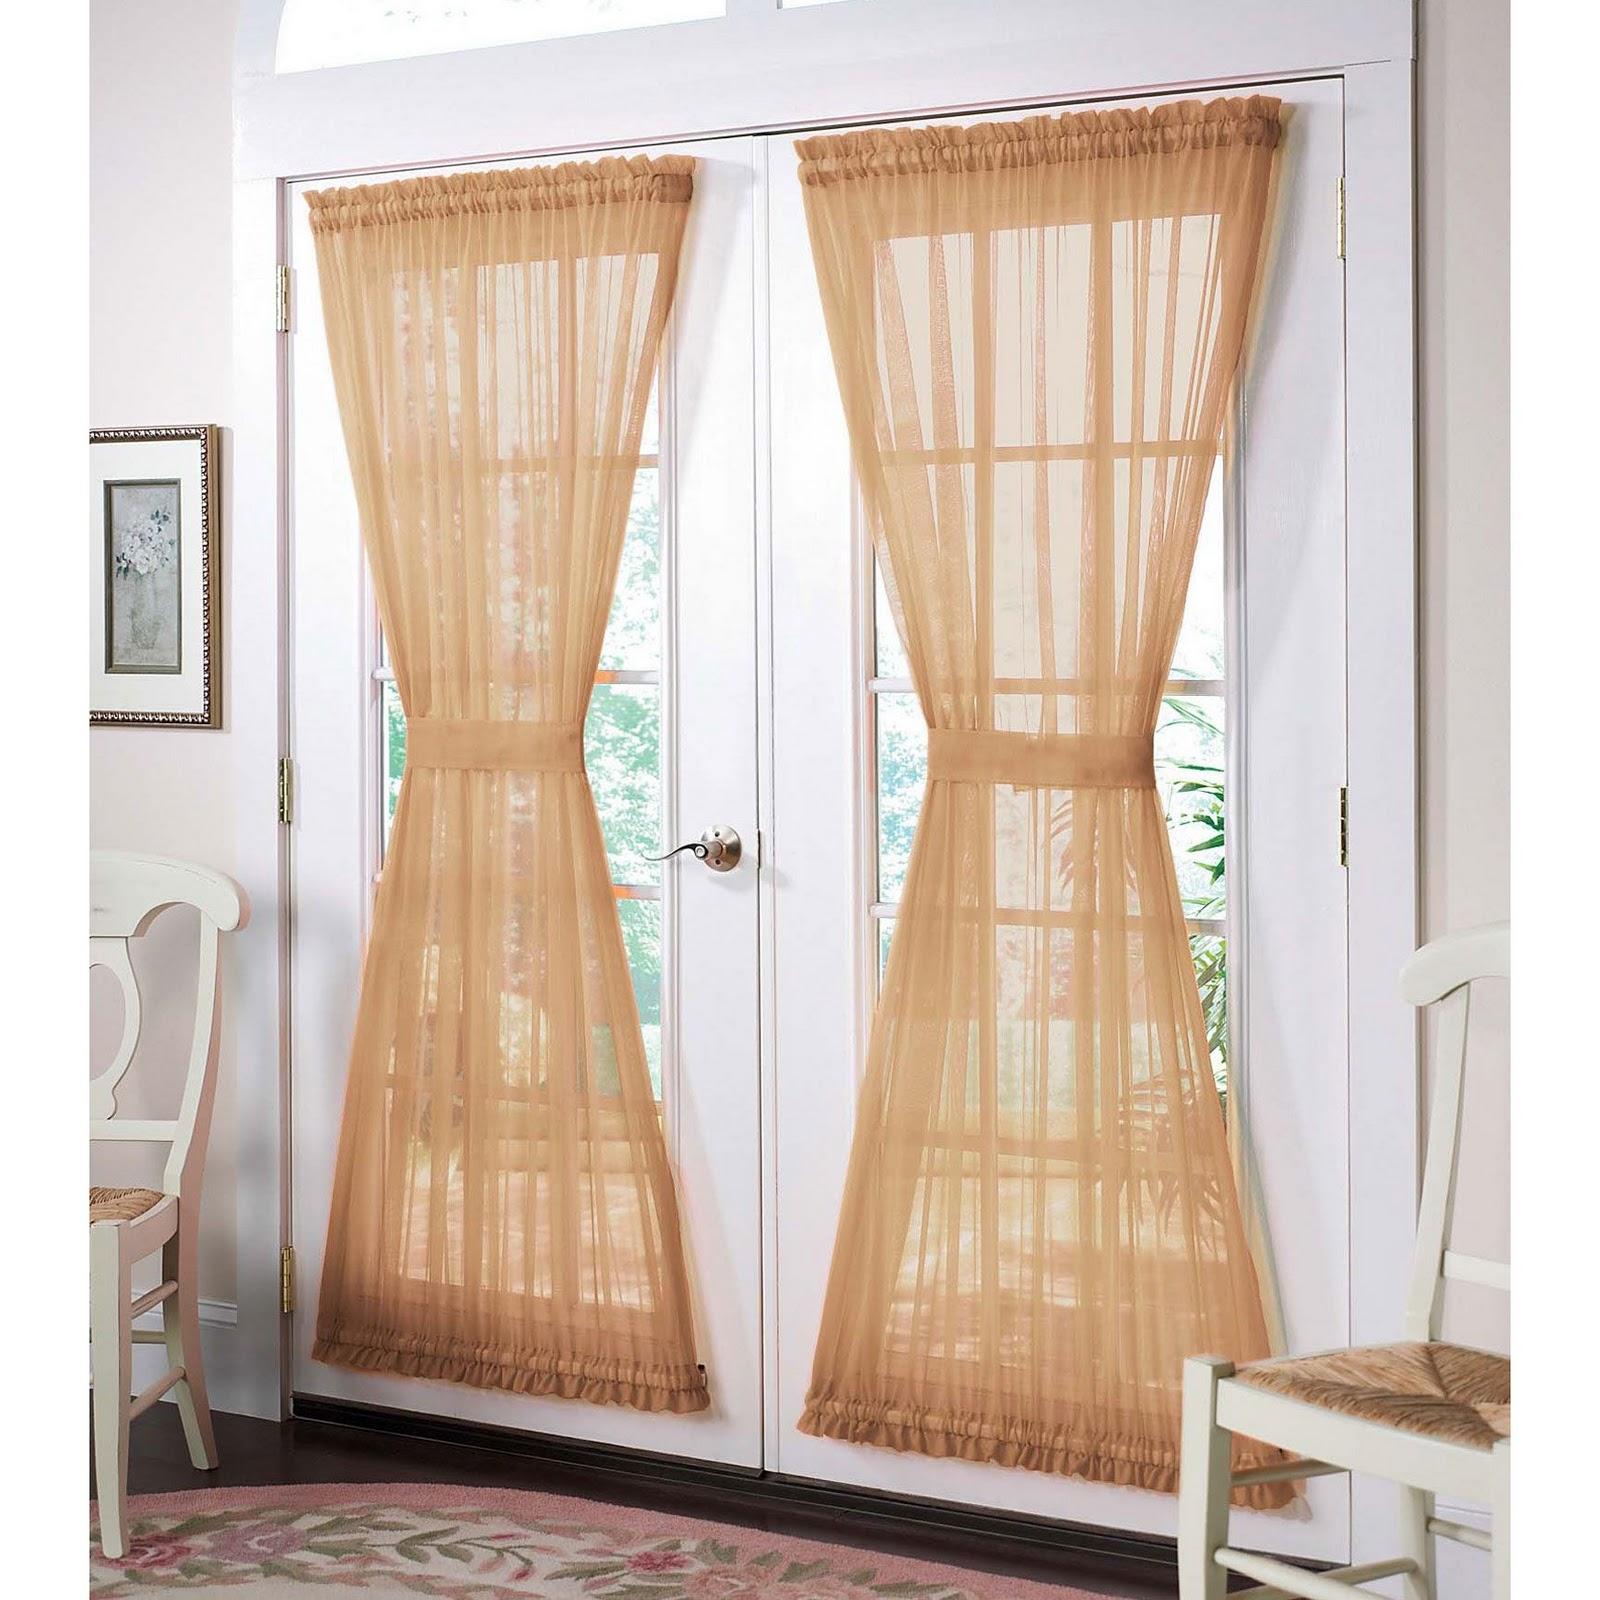 Id ias de cortinas para o ver o casas poss veis for Modelos de cortinas para puerta de cocina